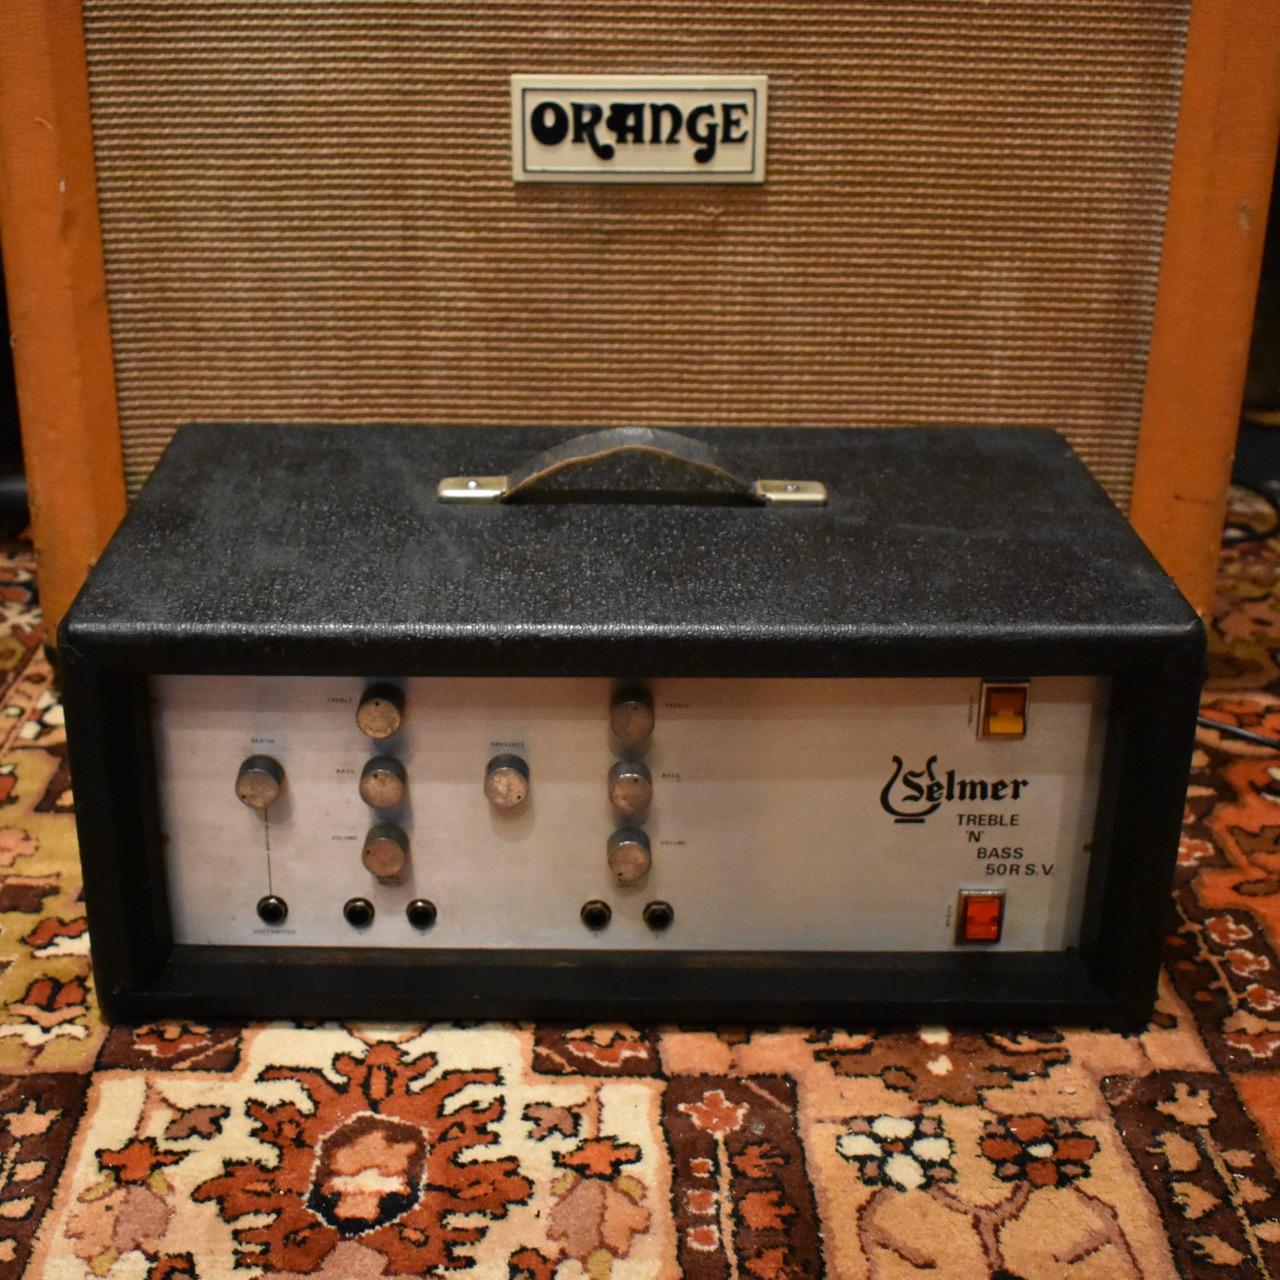 Vintage 1970s Selmer Treble N Bass 50 RS.V. Valve Amplifier